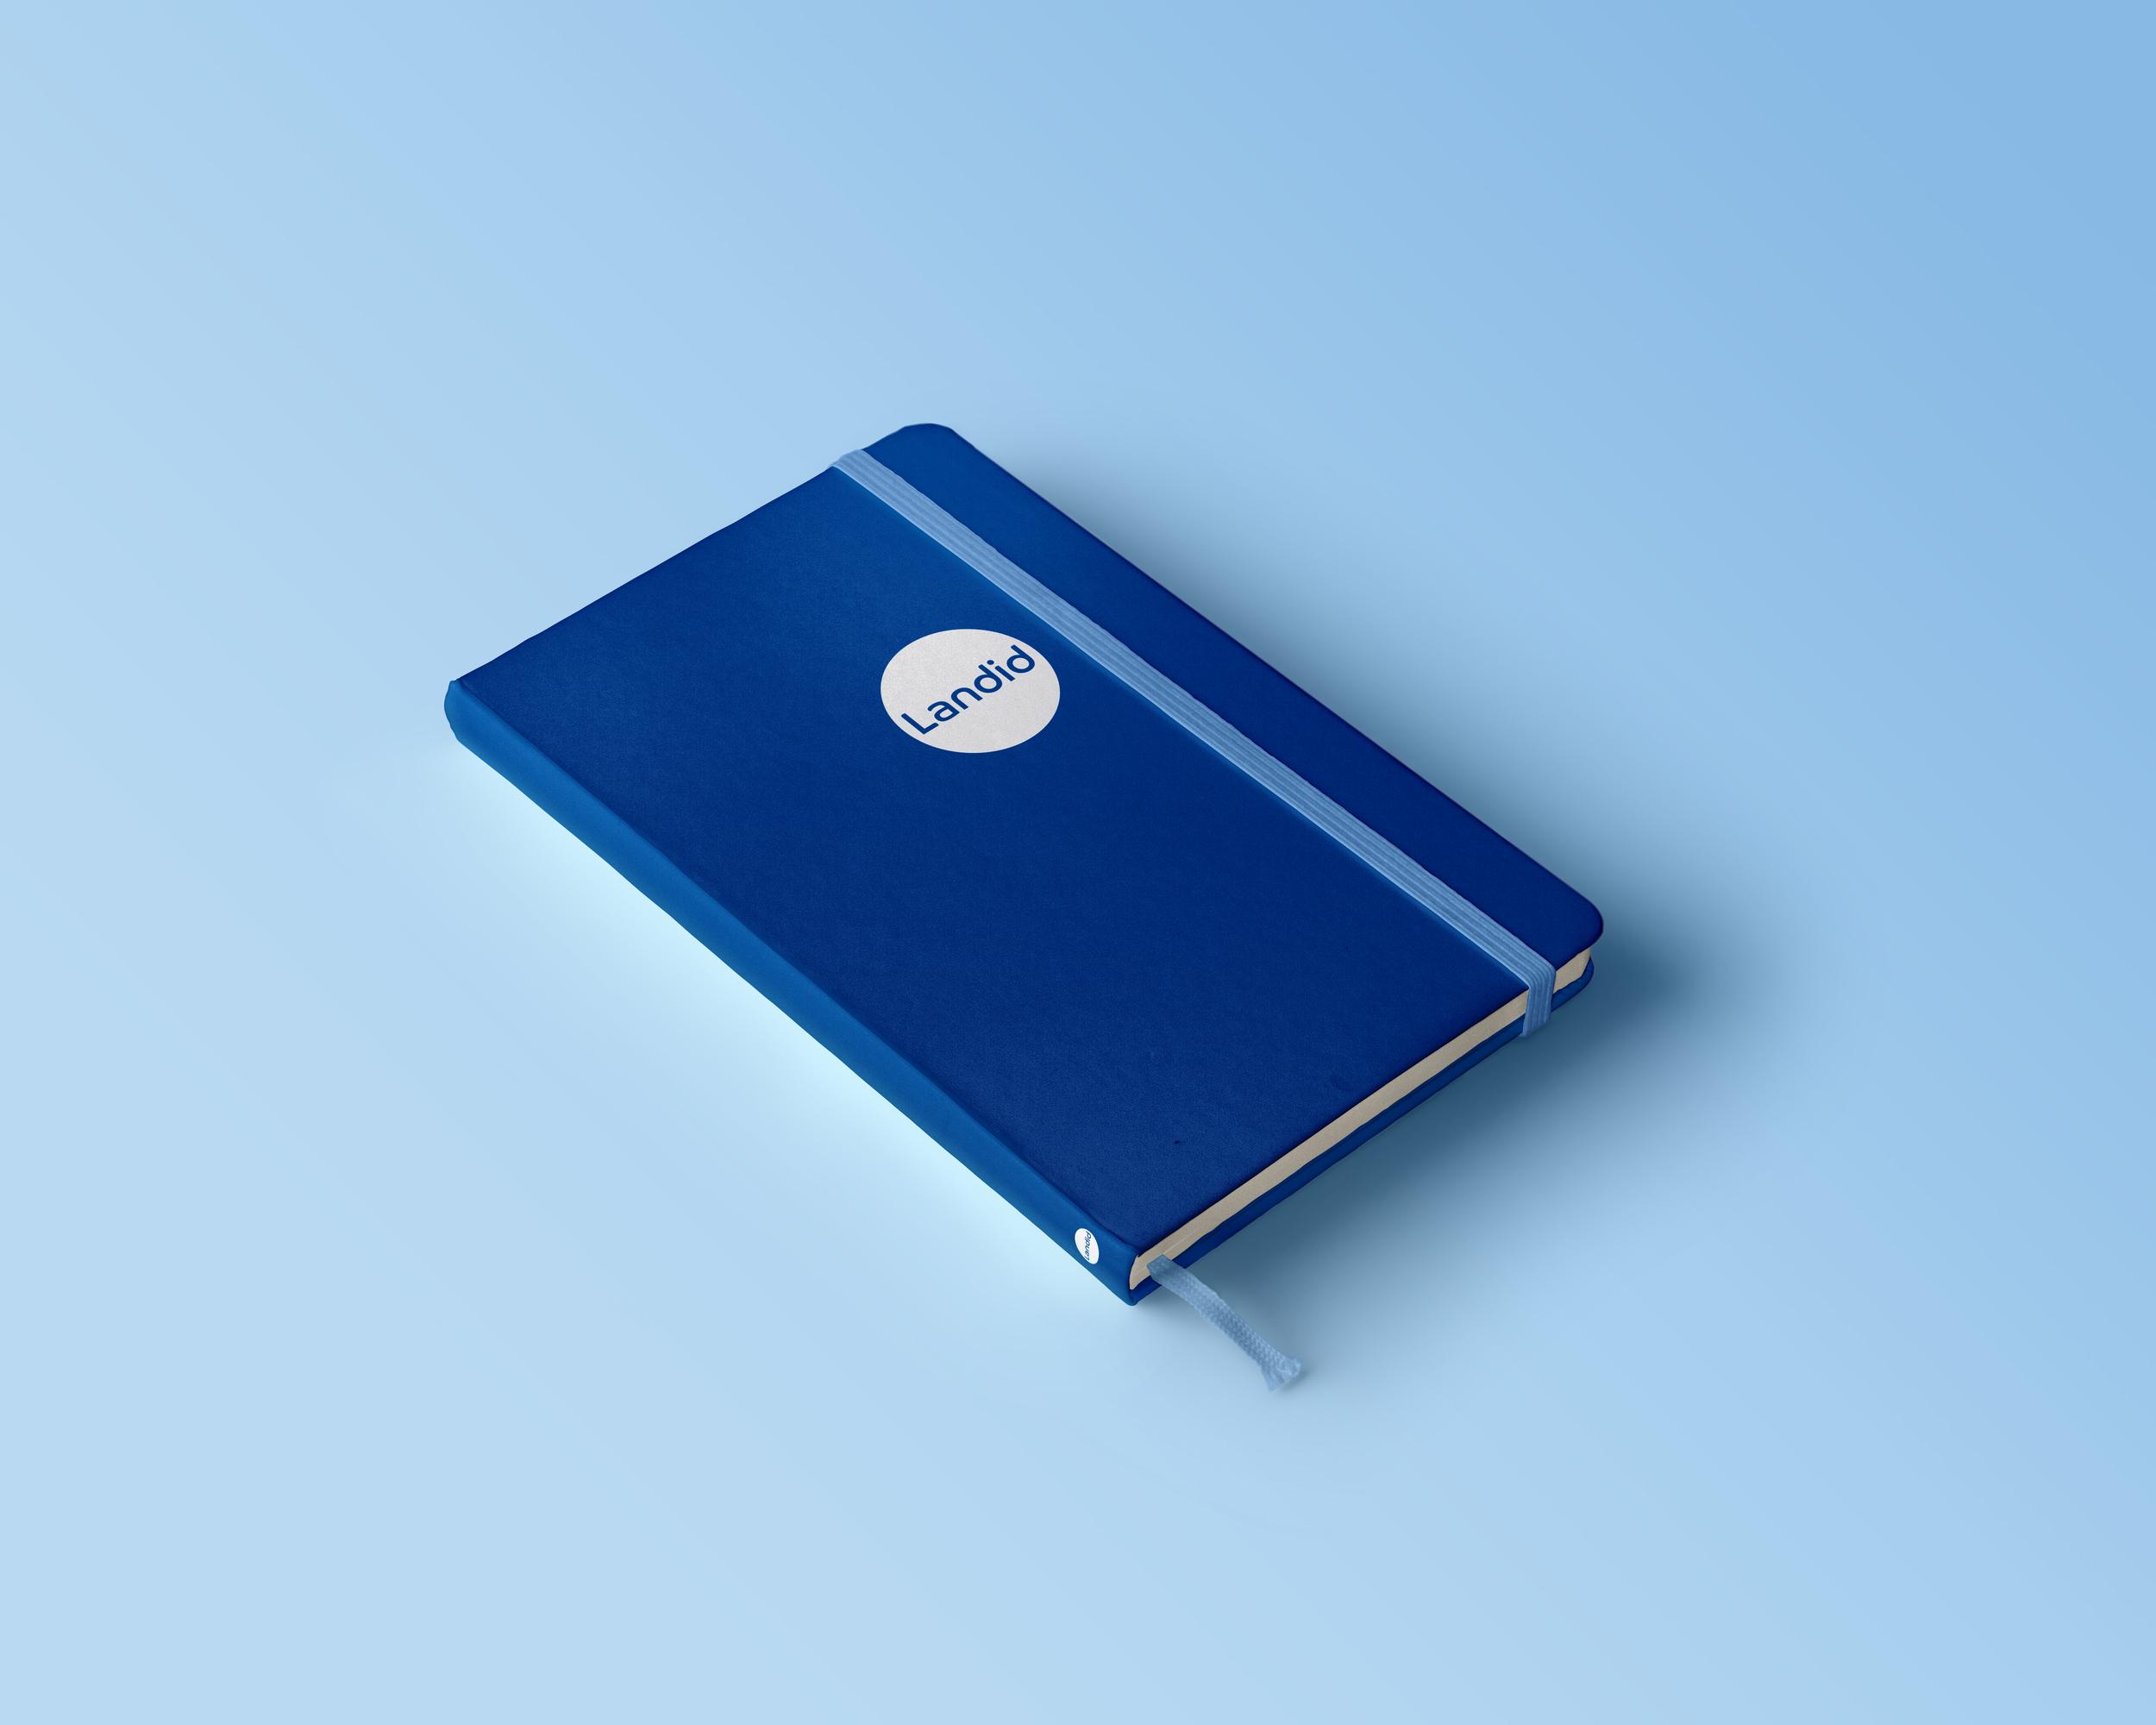 Landid branded moloeskin notebook against an on trend light blue back drop